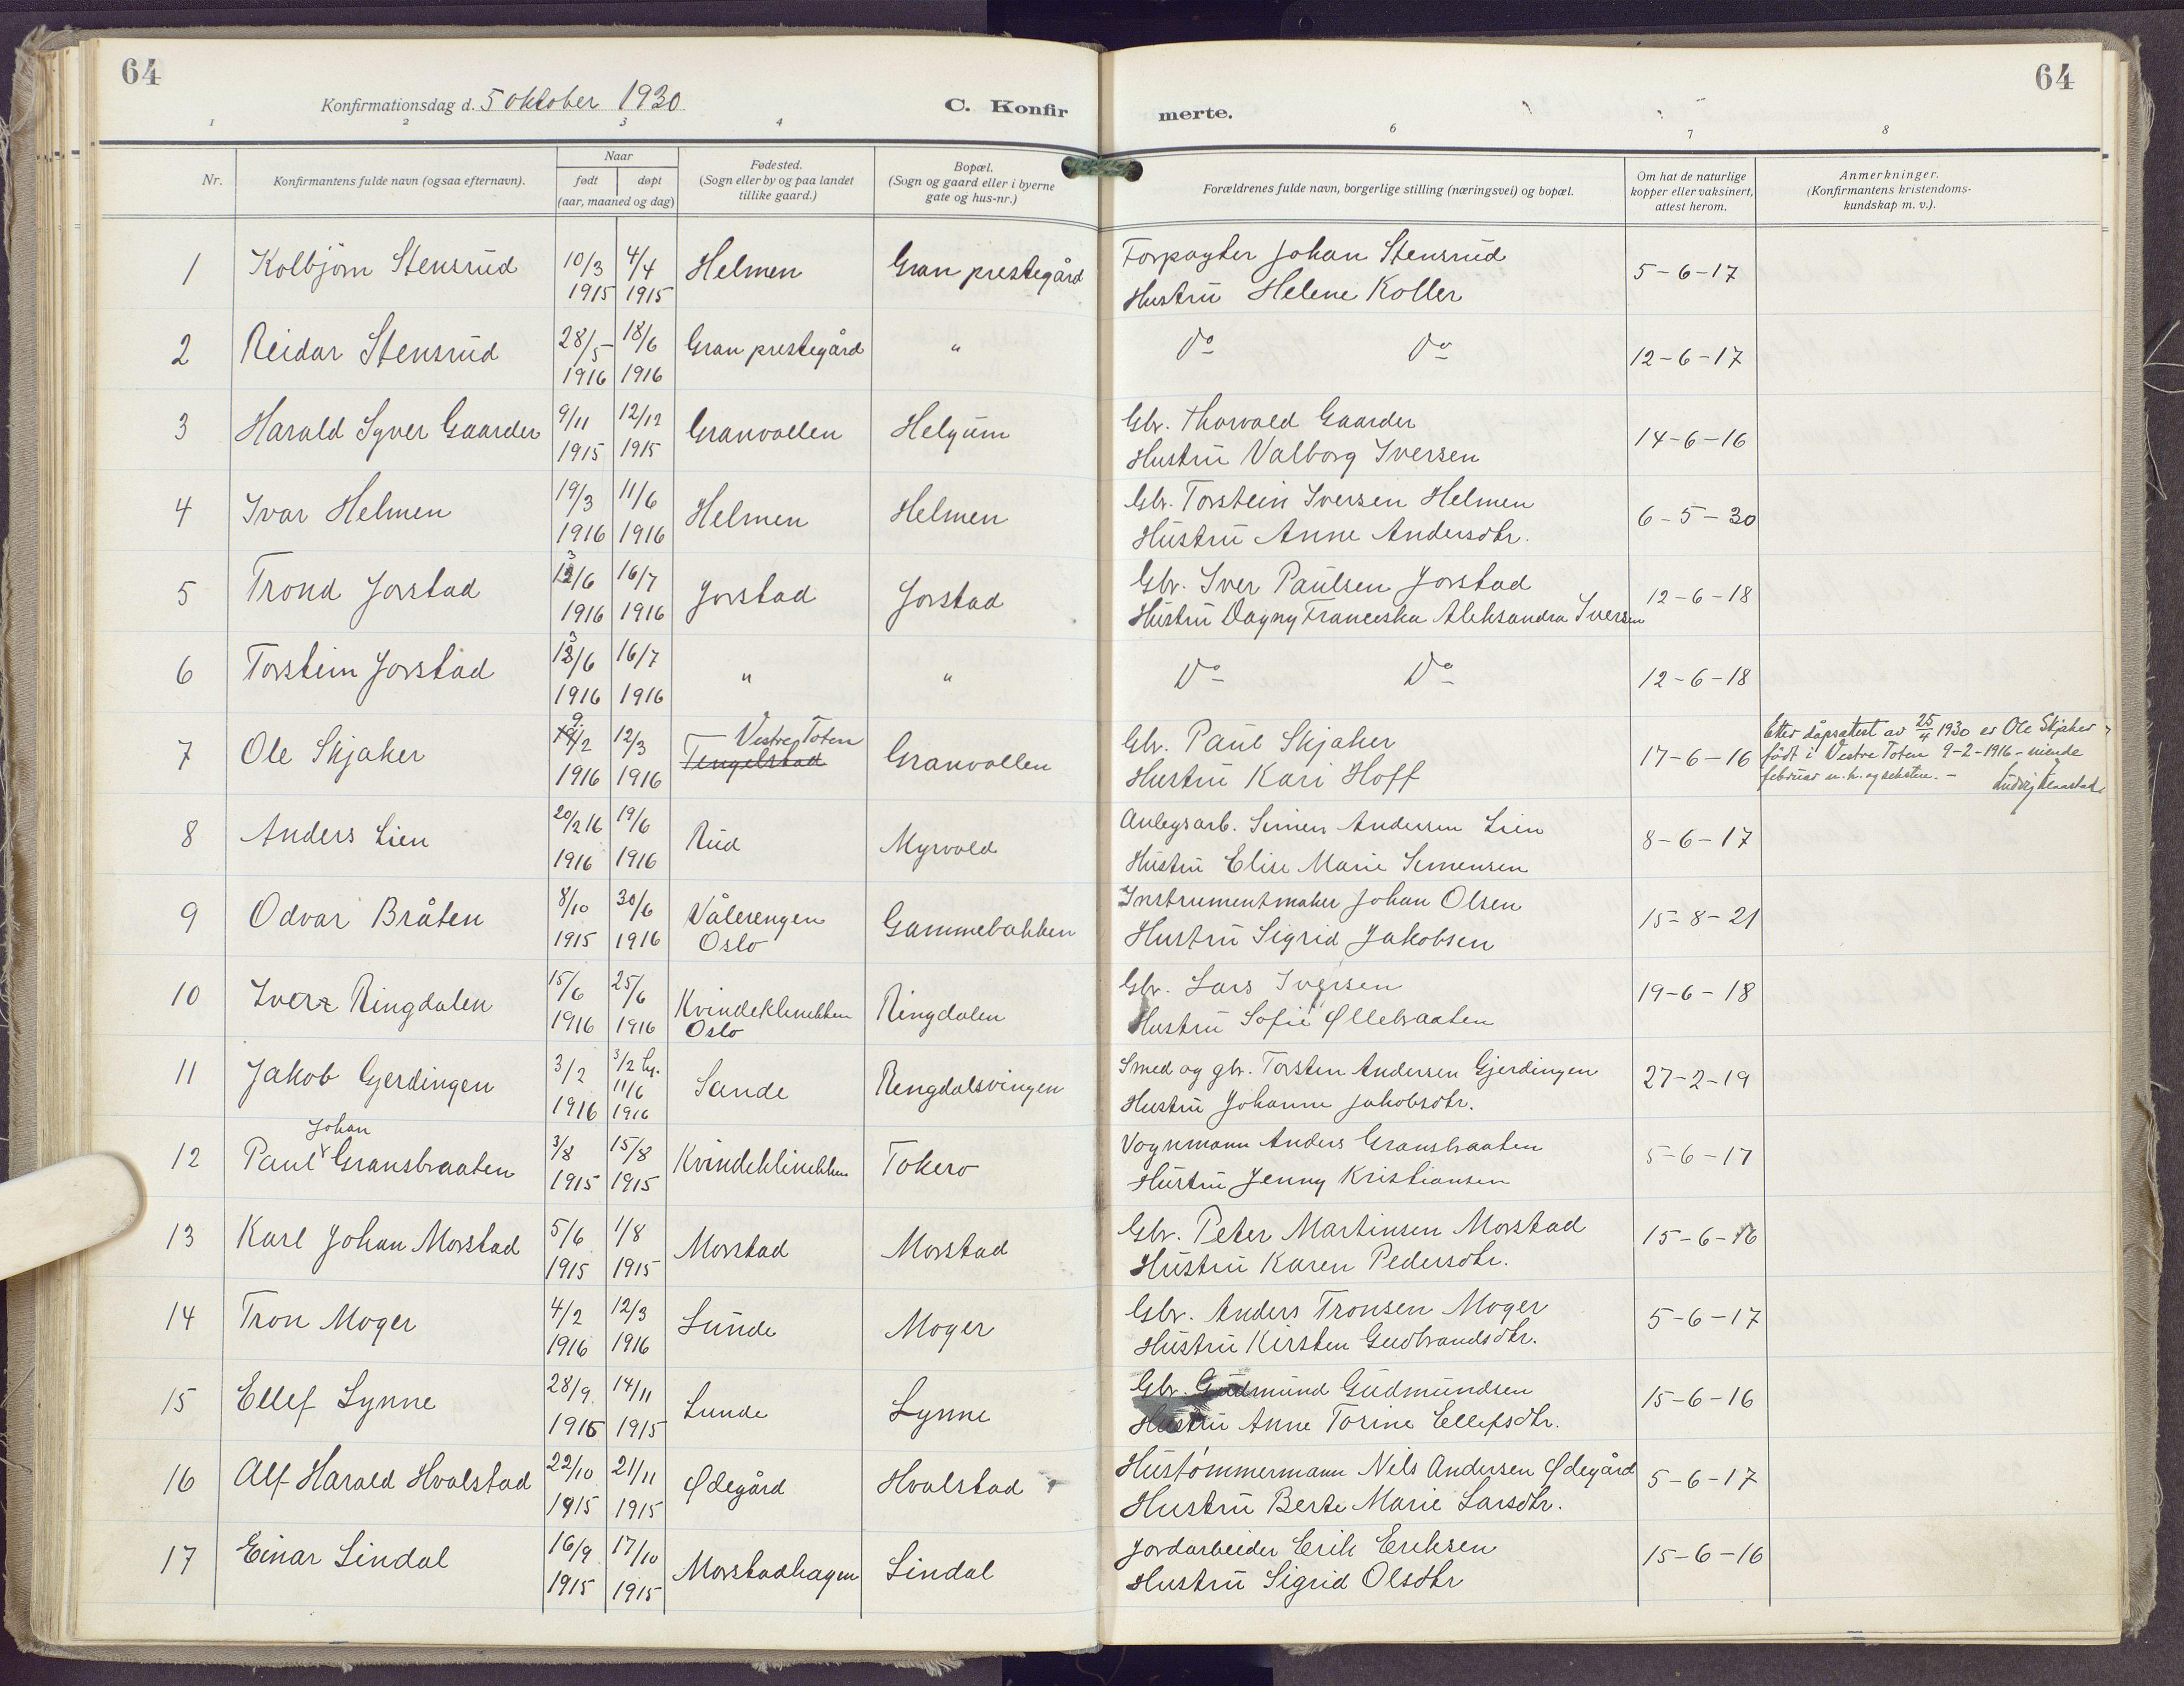 SAH, Gran prestekontor, Ministerialbok nr. 23, 1919-1938, s. 64